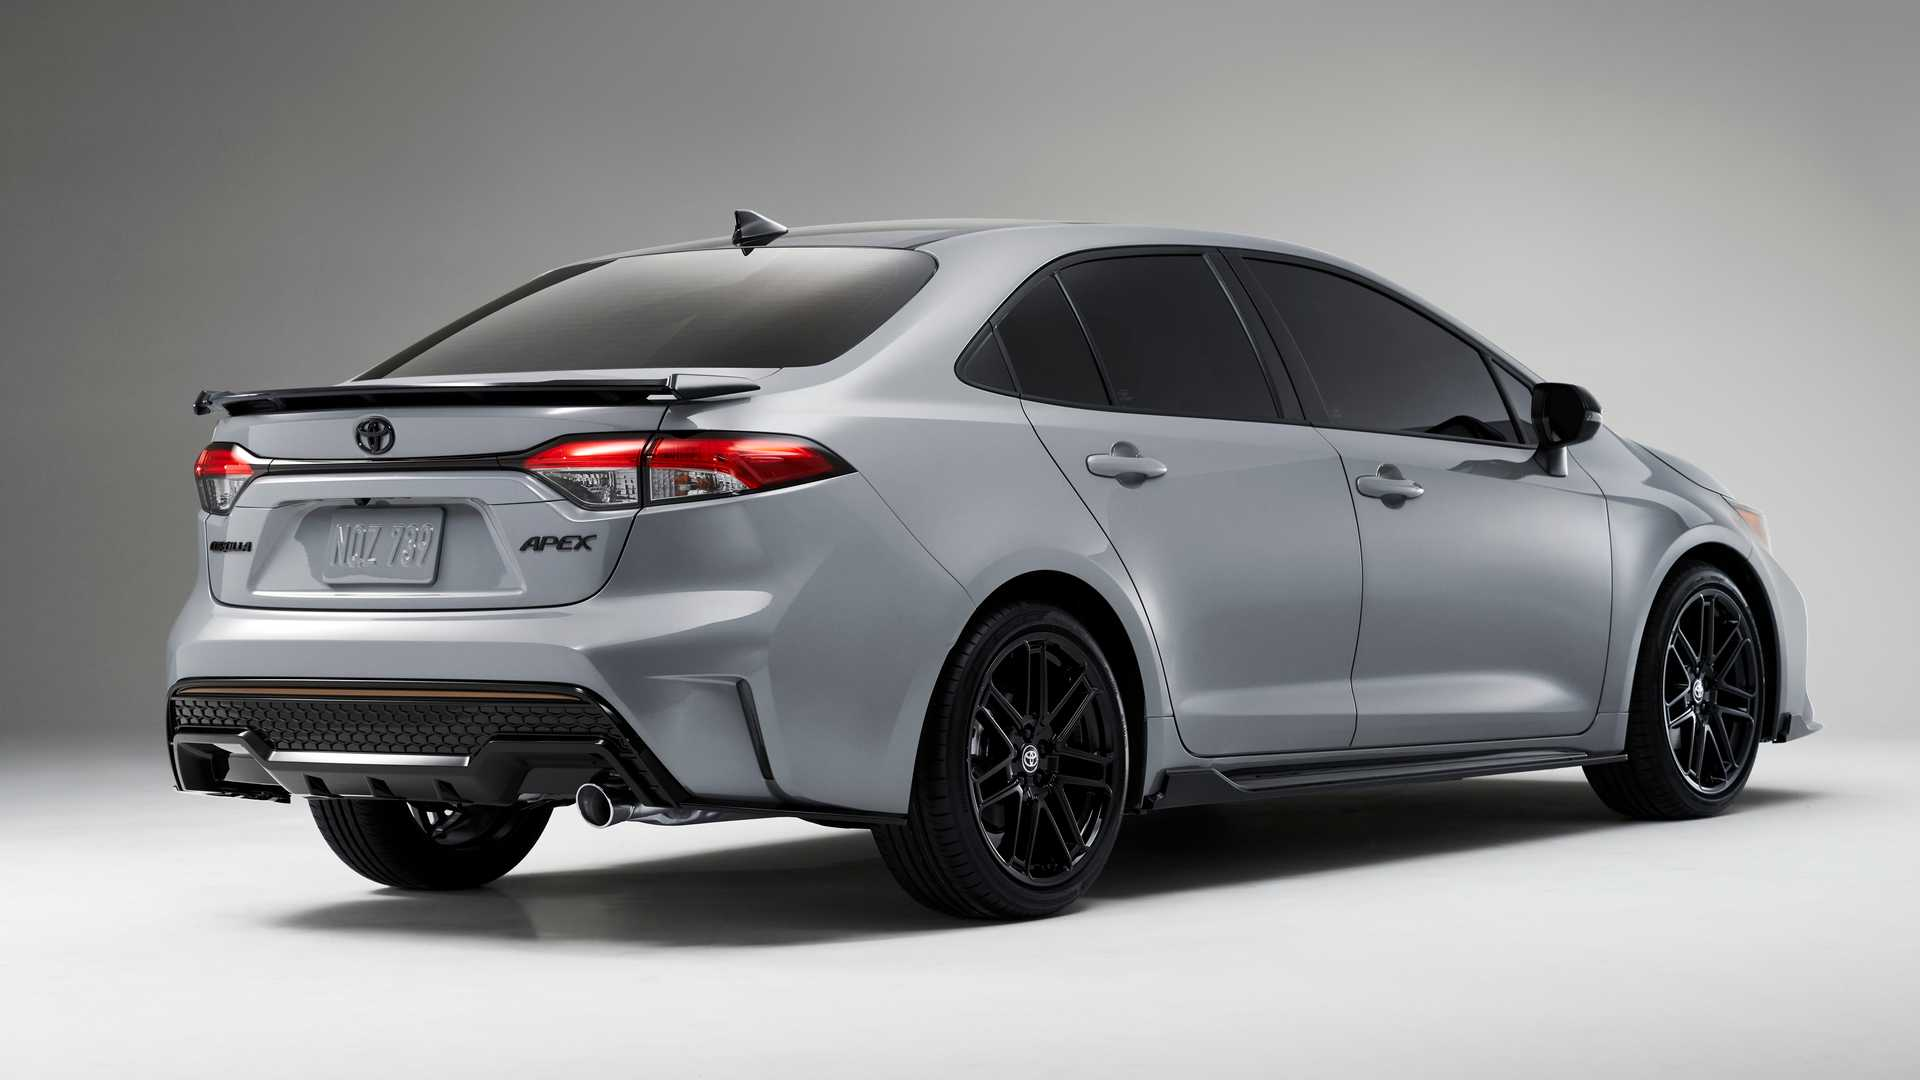 2018 - [Toyota] Corolla Sedan - Page 2 2021-toyota-corolla-apex-edition